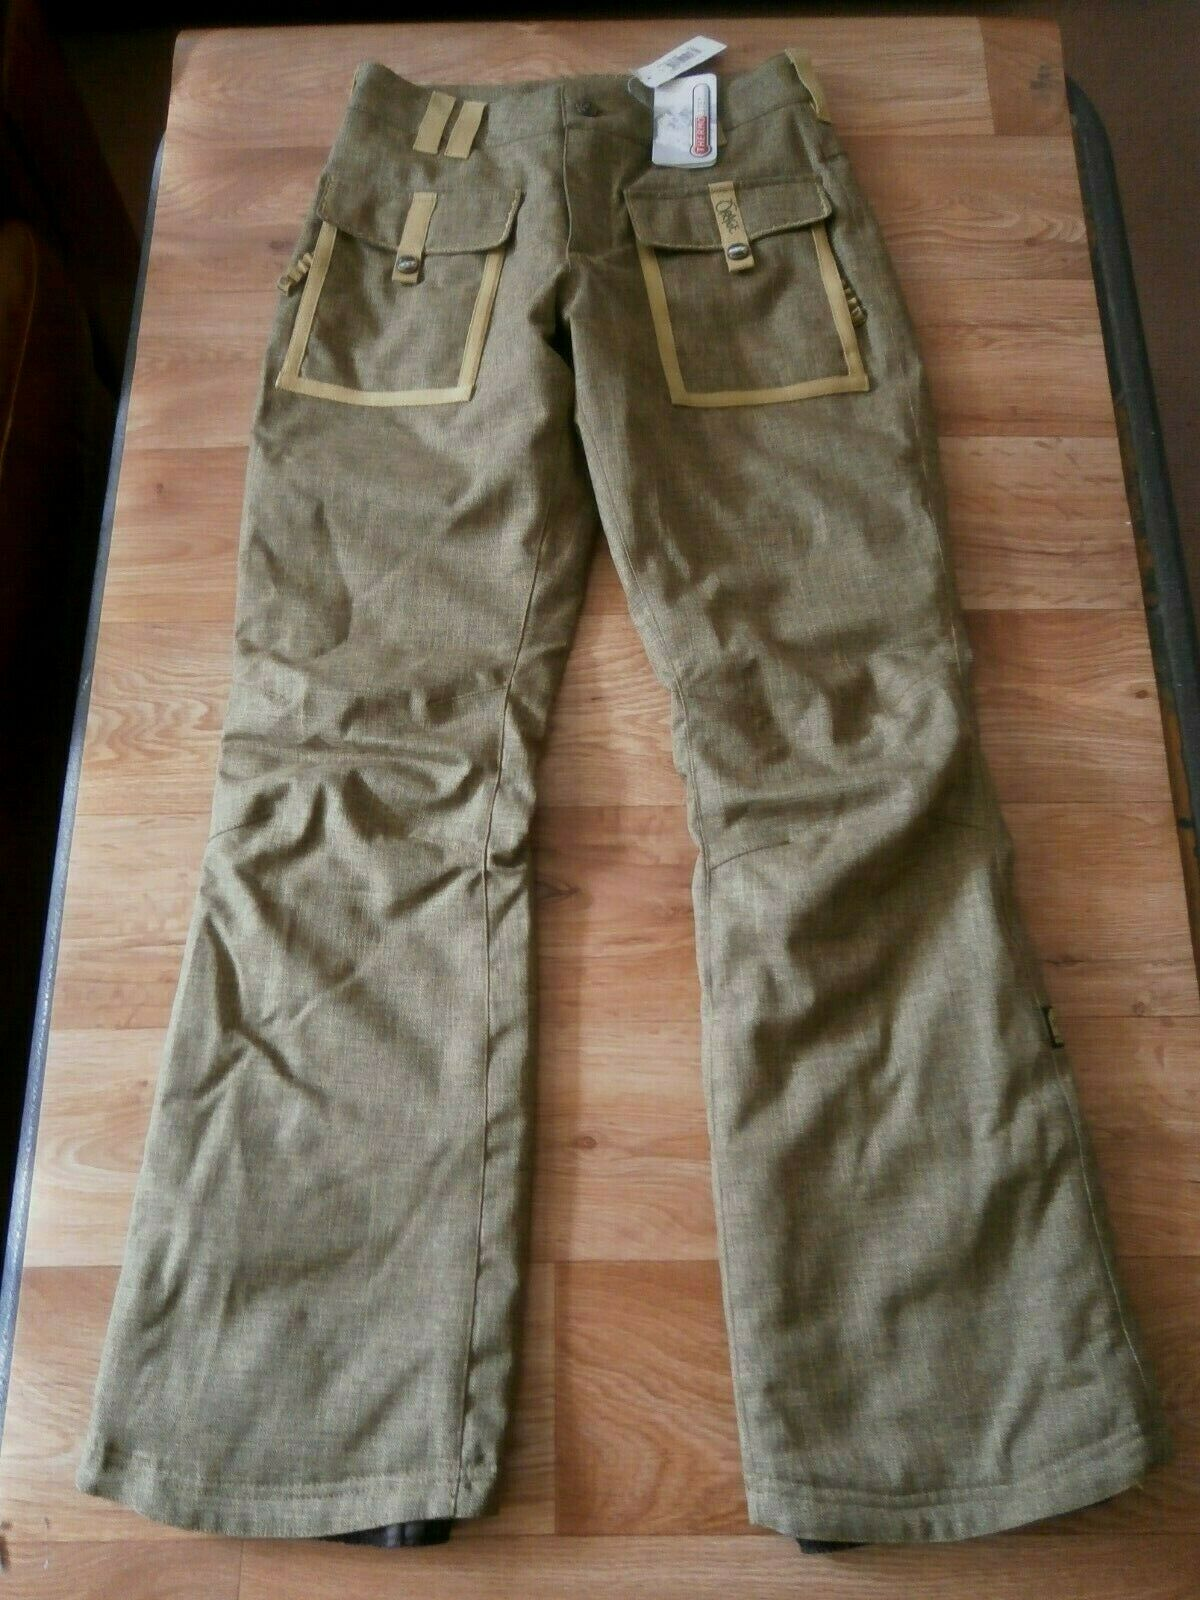 Fab damen Orage Gallery Ski Pants Khaki Größe Small  182 Euros see sizing